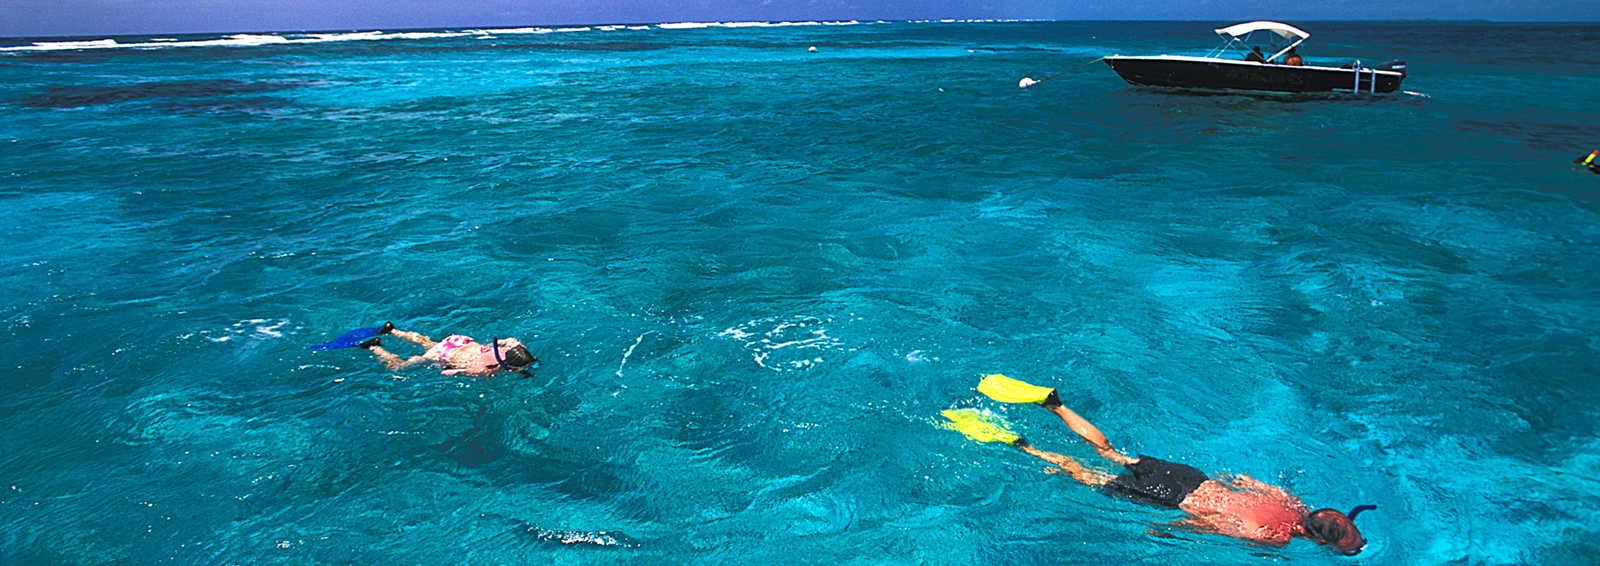 Snorkelling at Hol Chan Marine Reserve, Belize